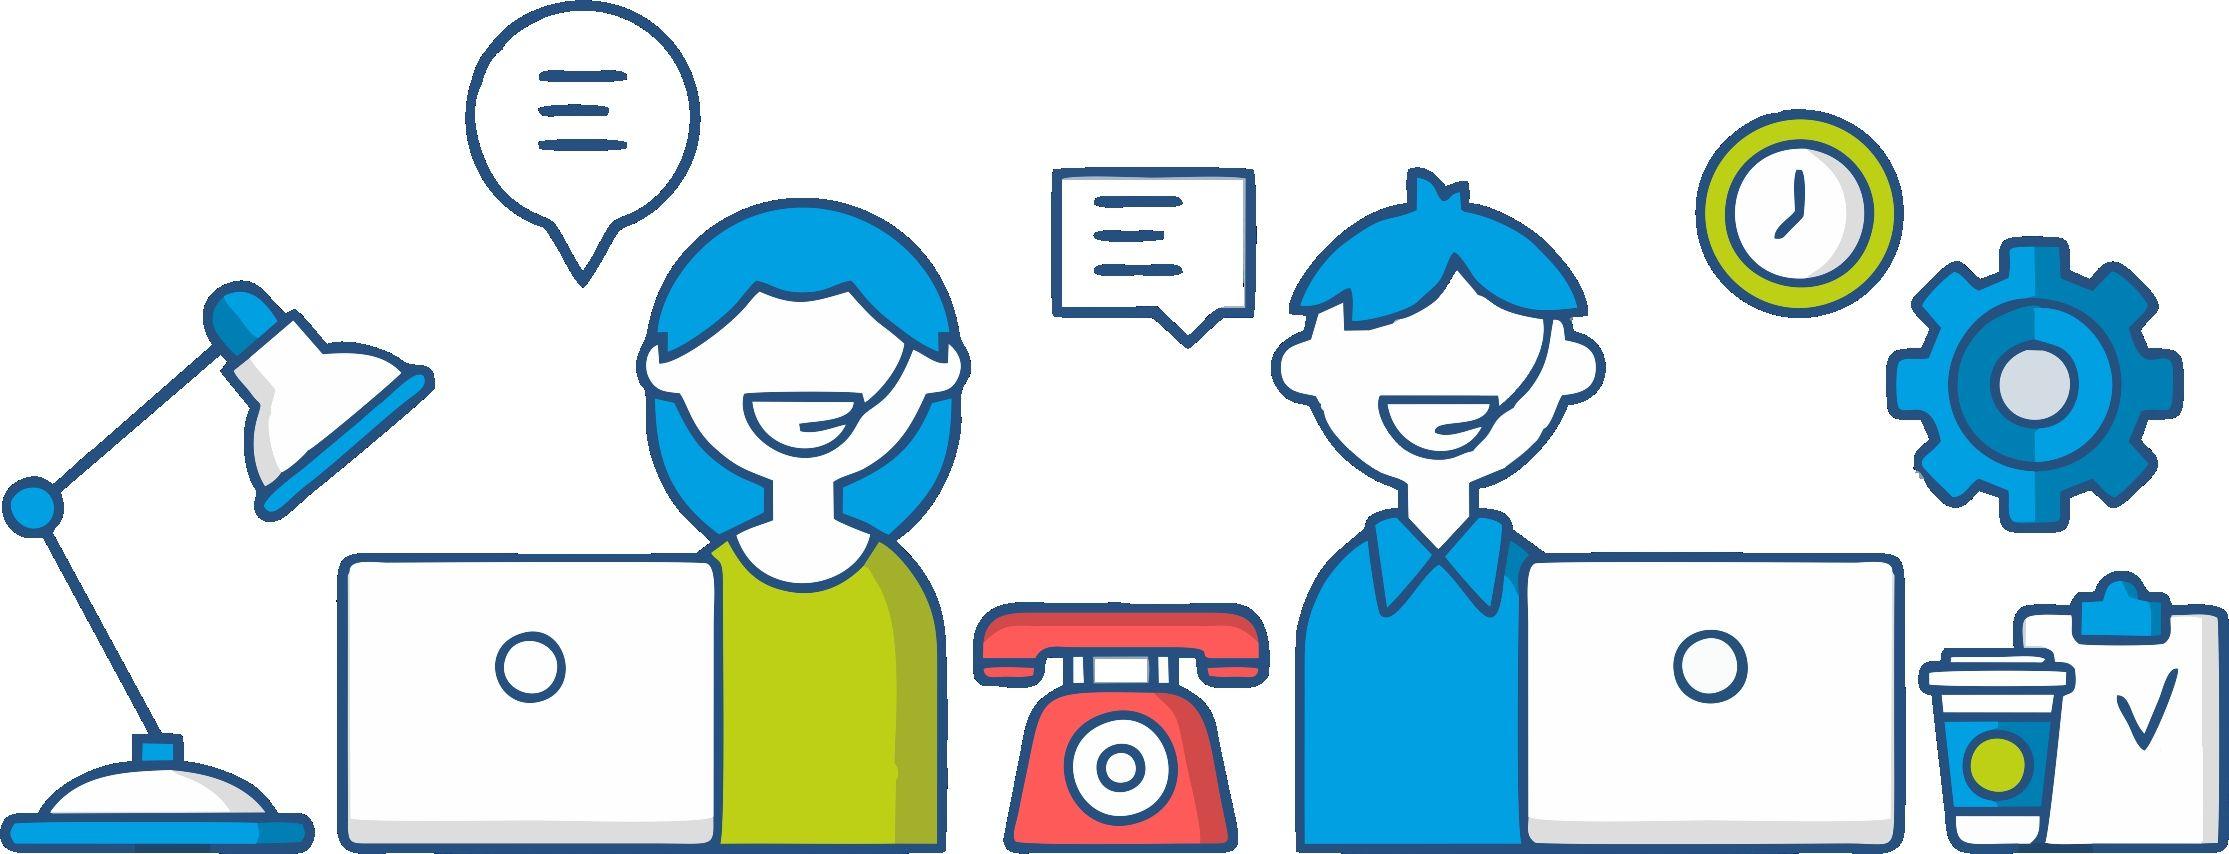 Customer Service Clipart In 2021 Clip Art Png Images Cartoon Clip Art